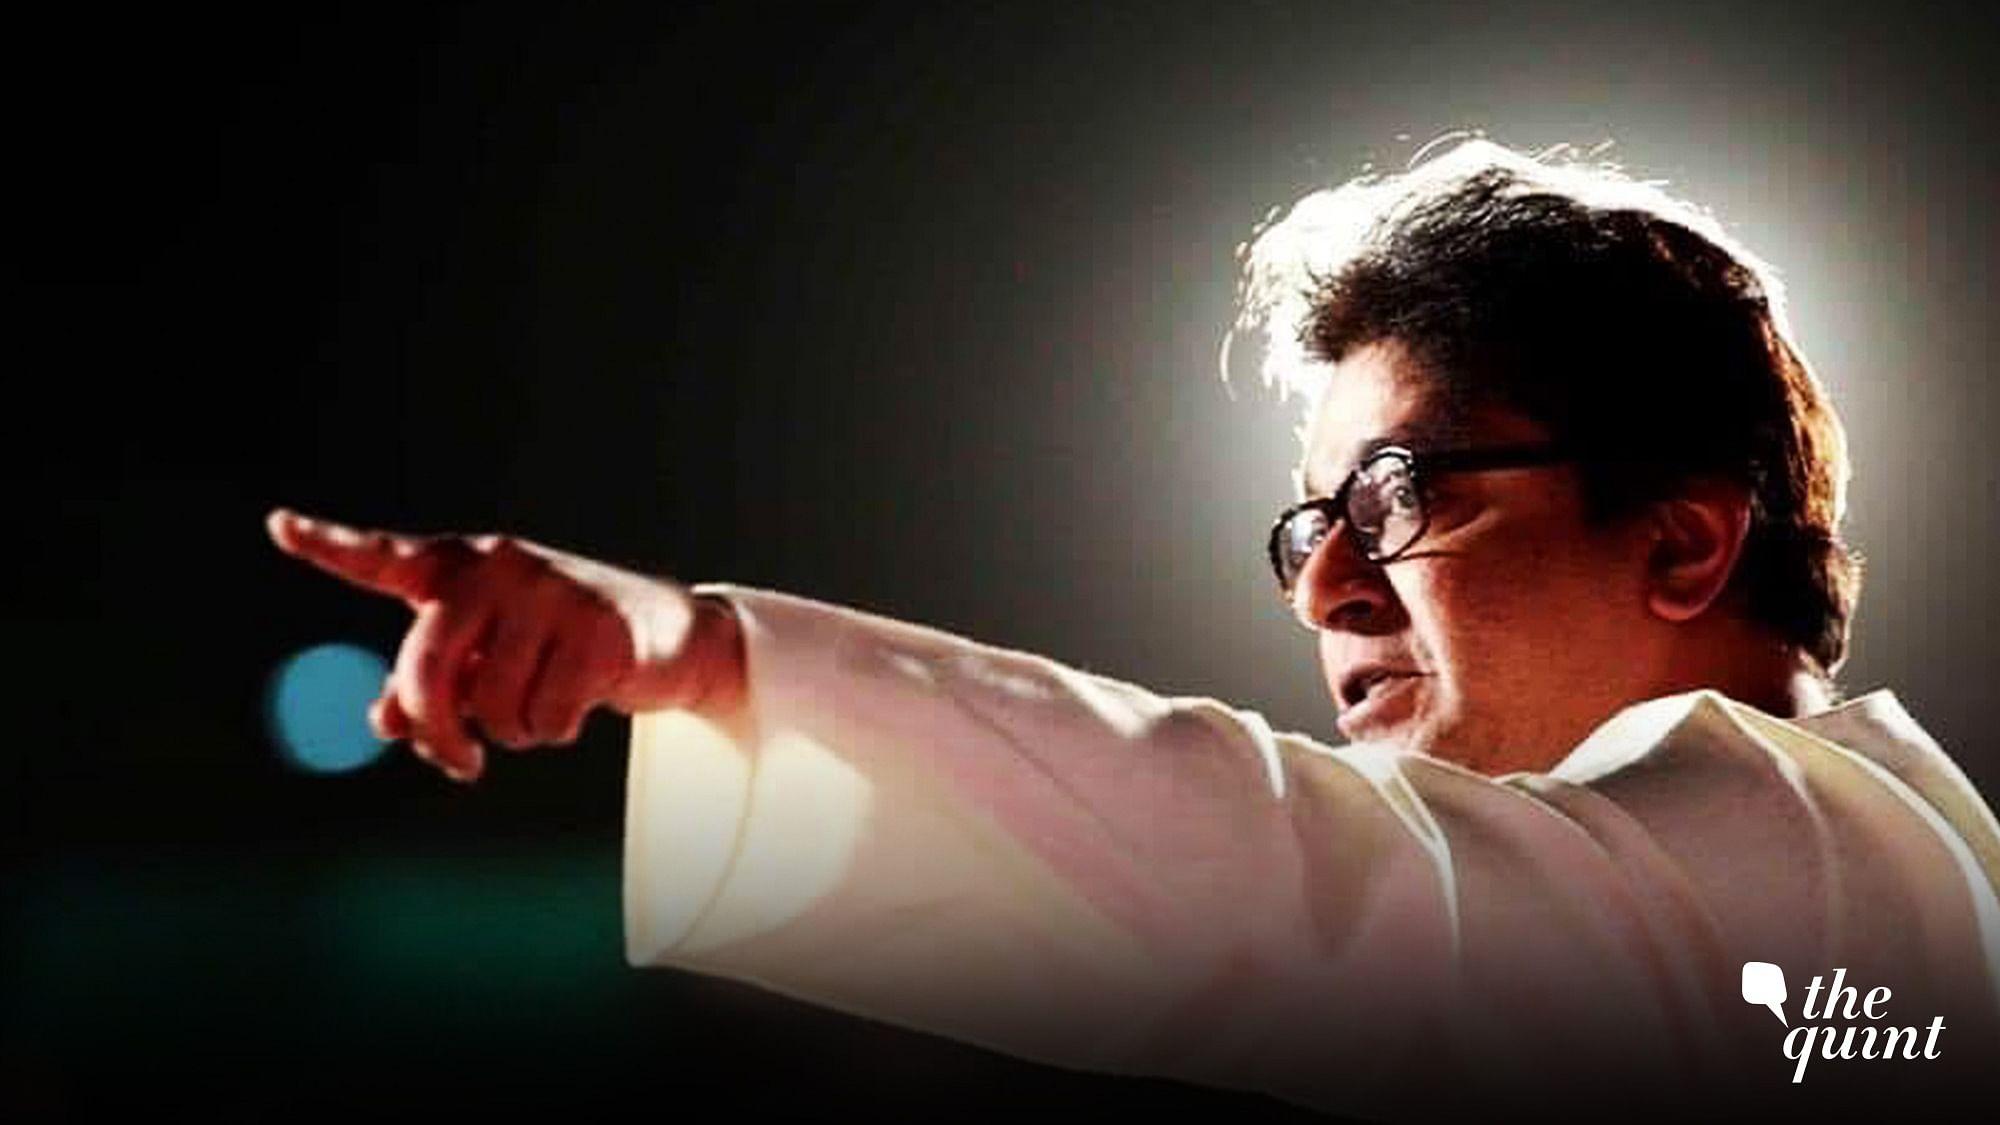 Raj Thackeray Indicates Shift to Hindutva, Targets `Infiltrators'